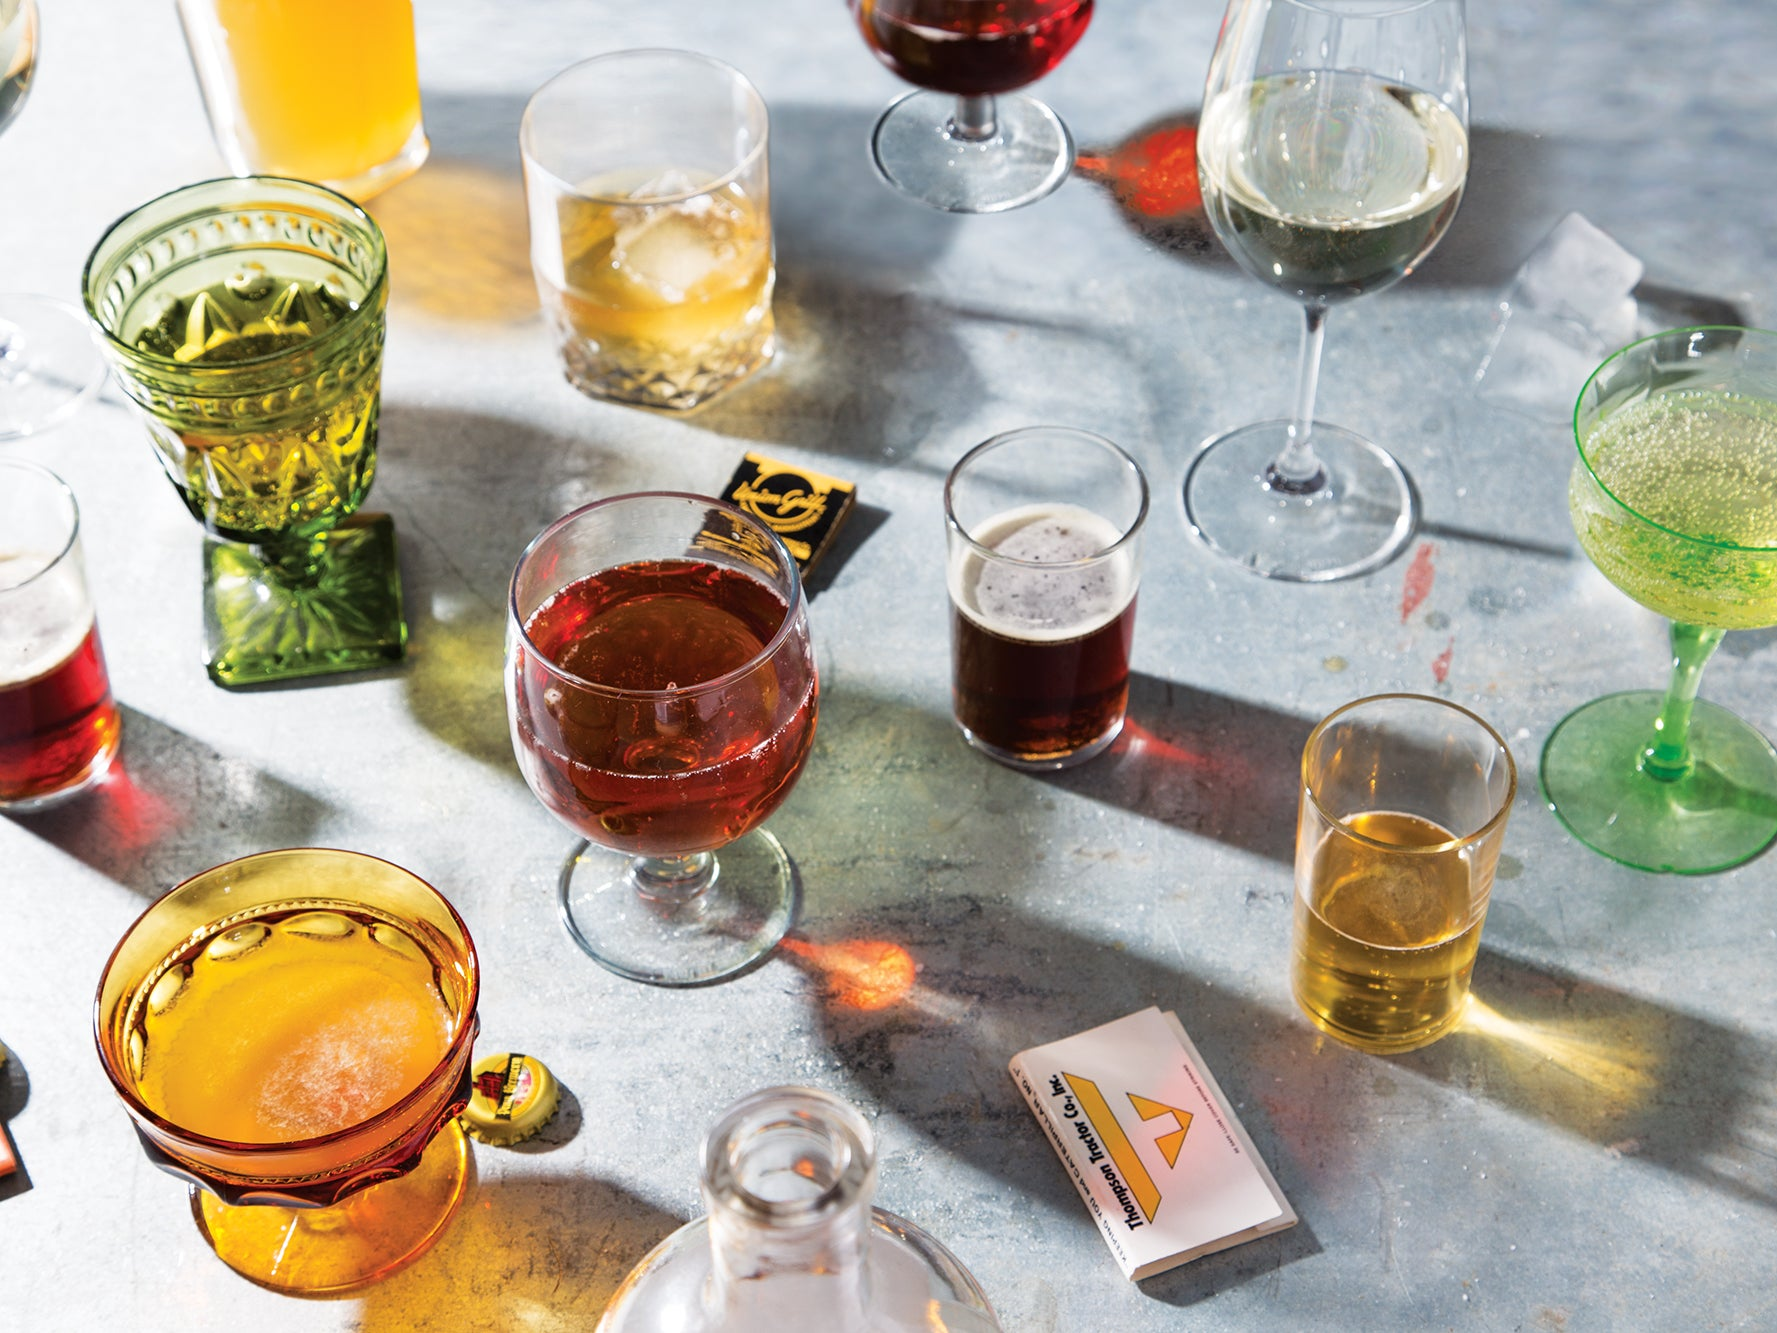 pittsburgh, drink, wine, beer, cocktails, spirits, distillery, brewery